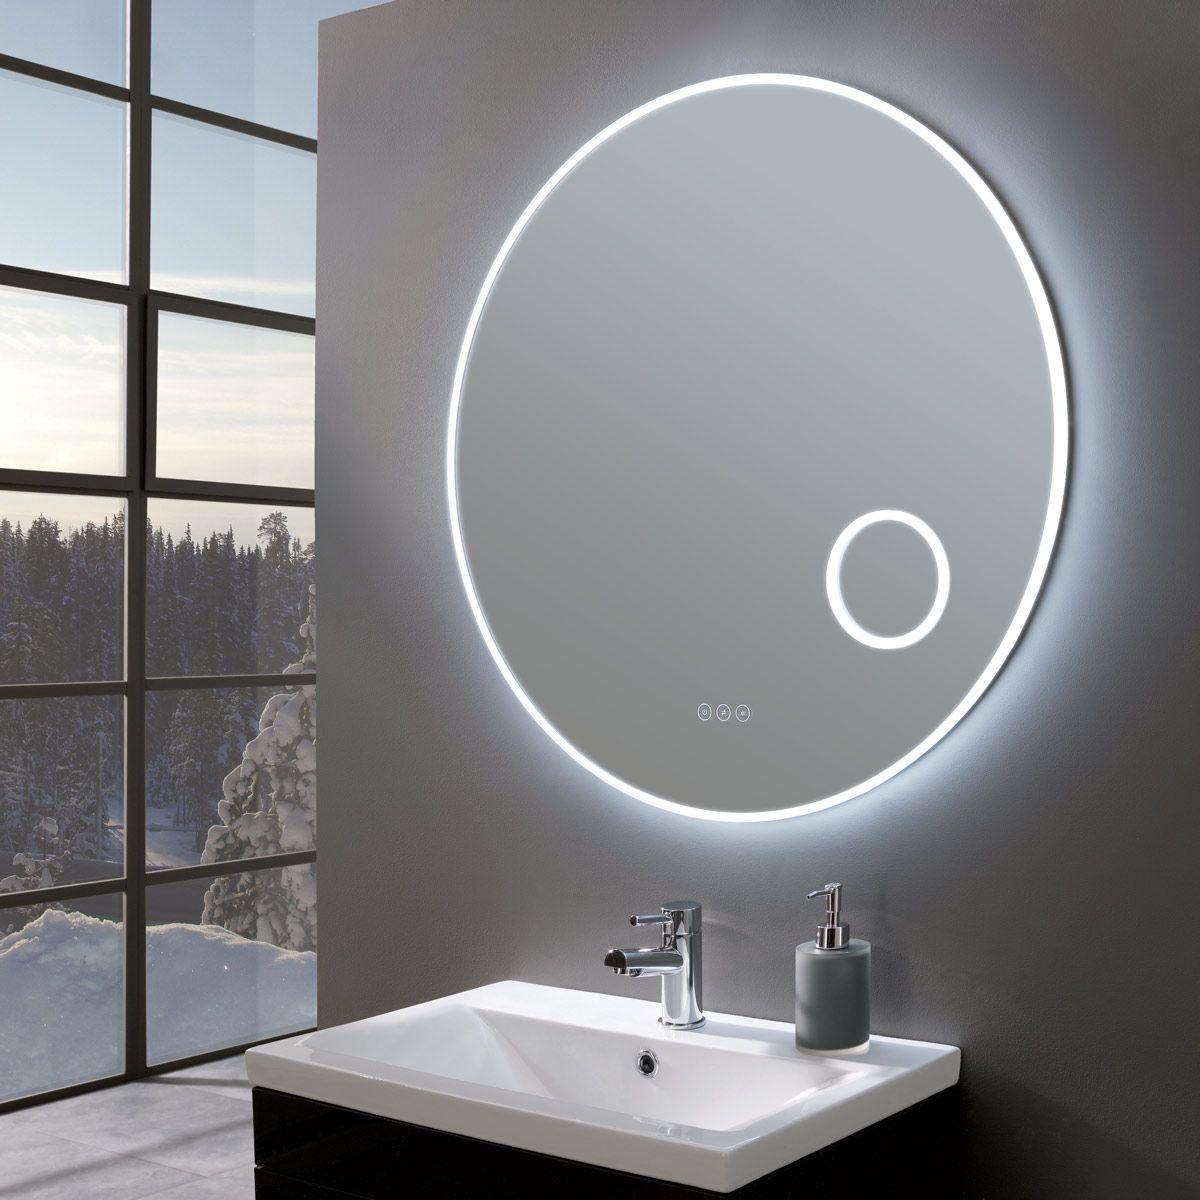 allureultraslimroundledilluminatedmirrorwithmagnifier600mm